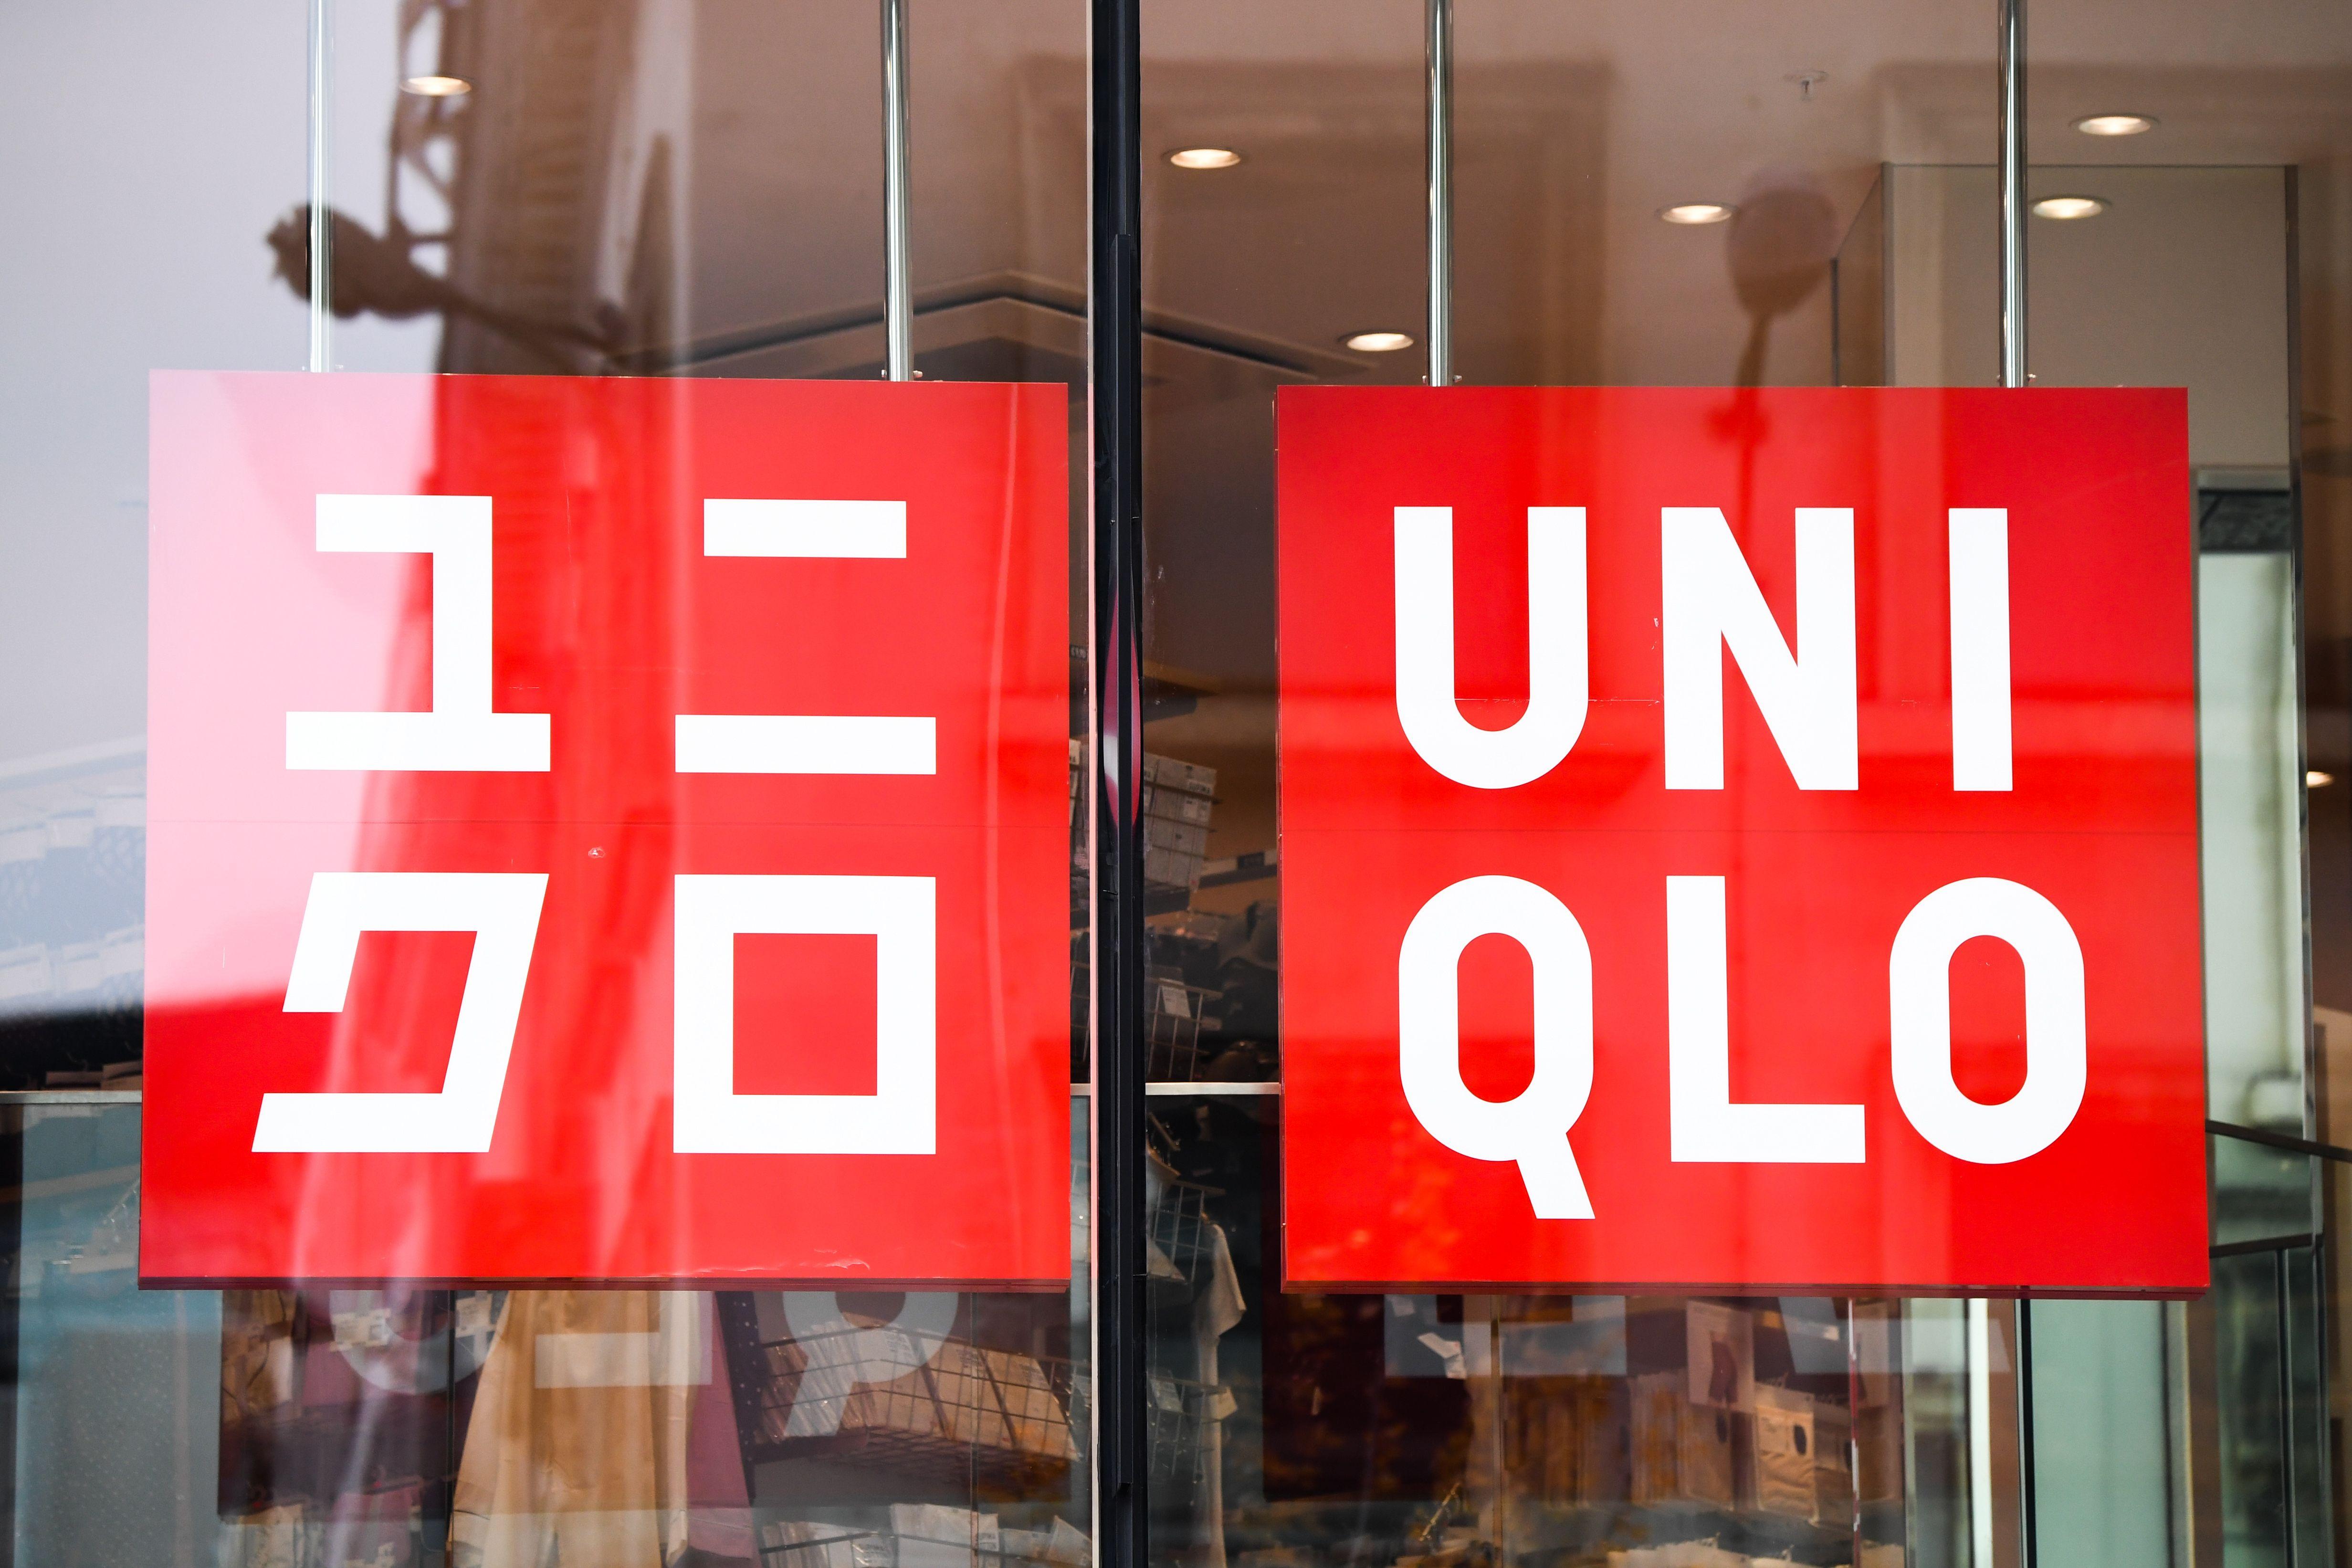 Uniglo shop in BrusselsUniqlo Shop, Brussels, Belgium - 16 Nov 2017